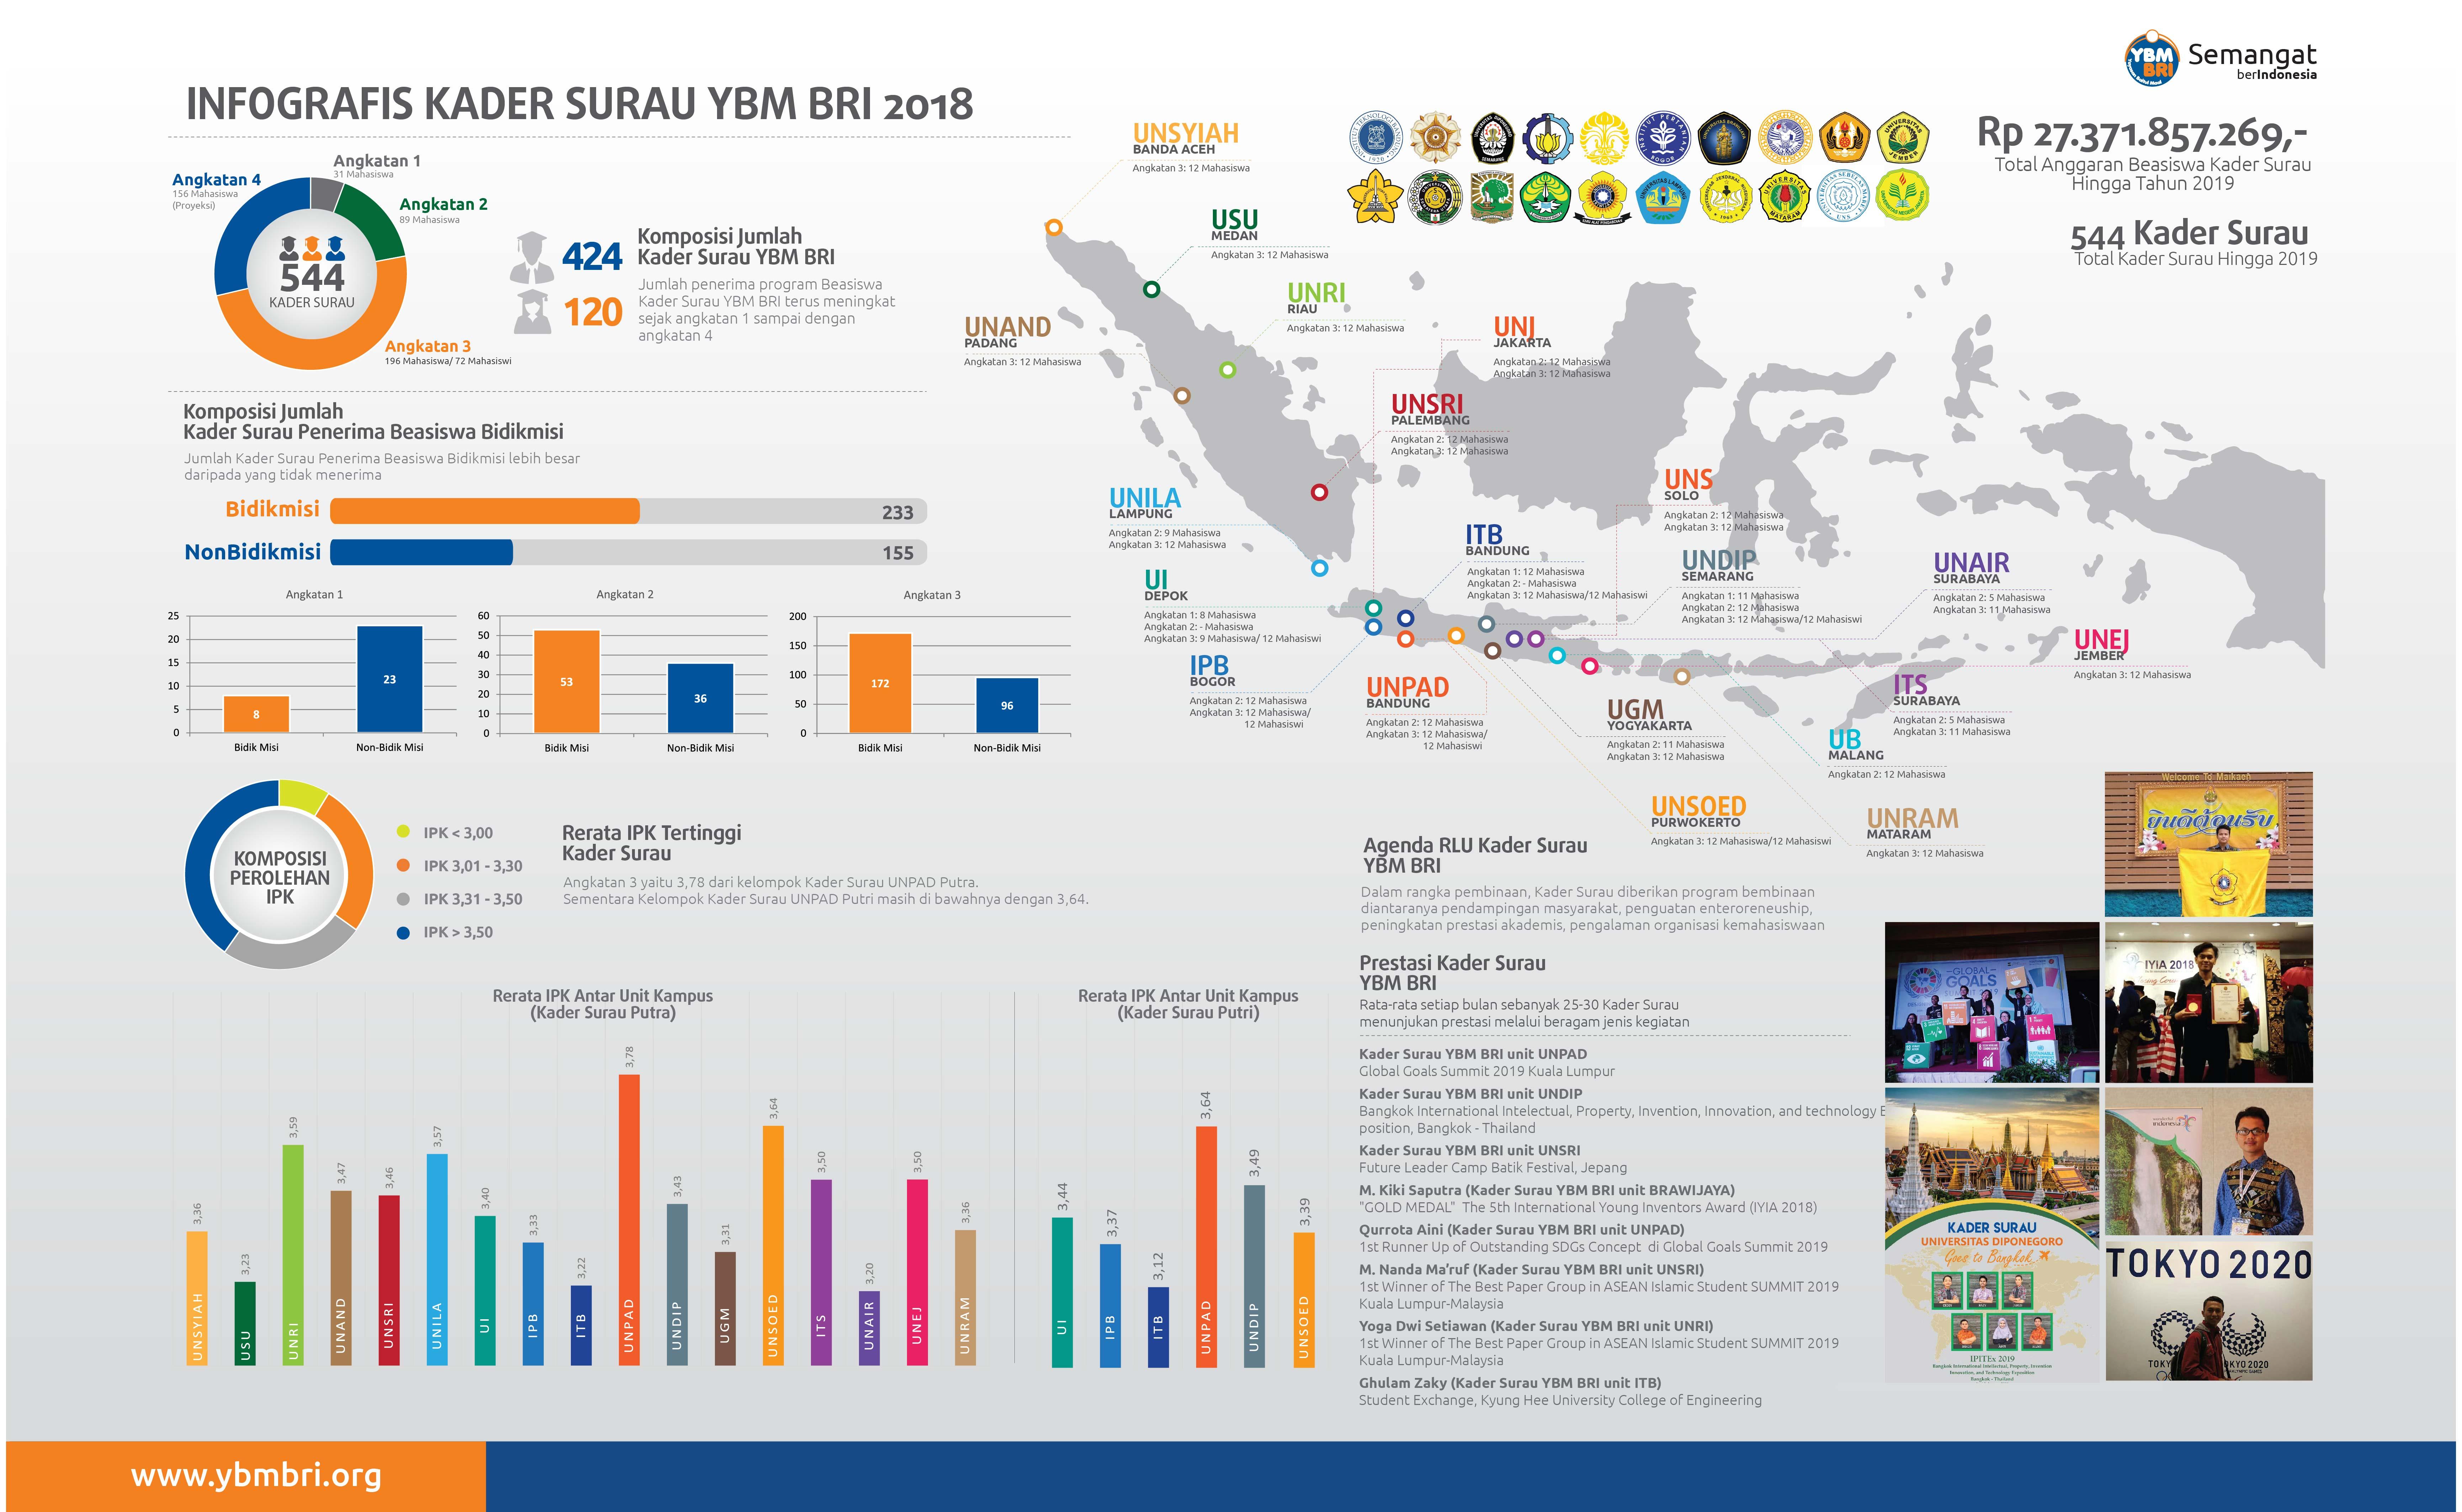 Infografis Program Beasiswa Kader Surau YBM BRI 2018